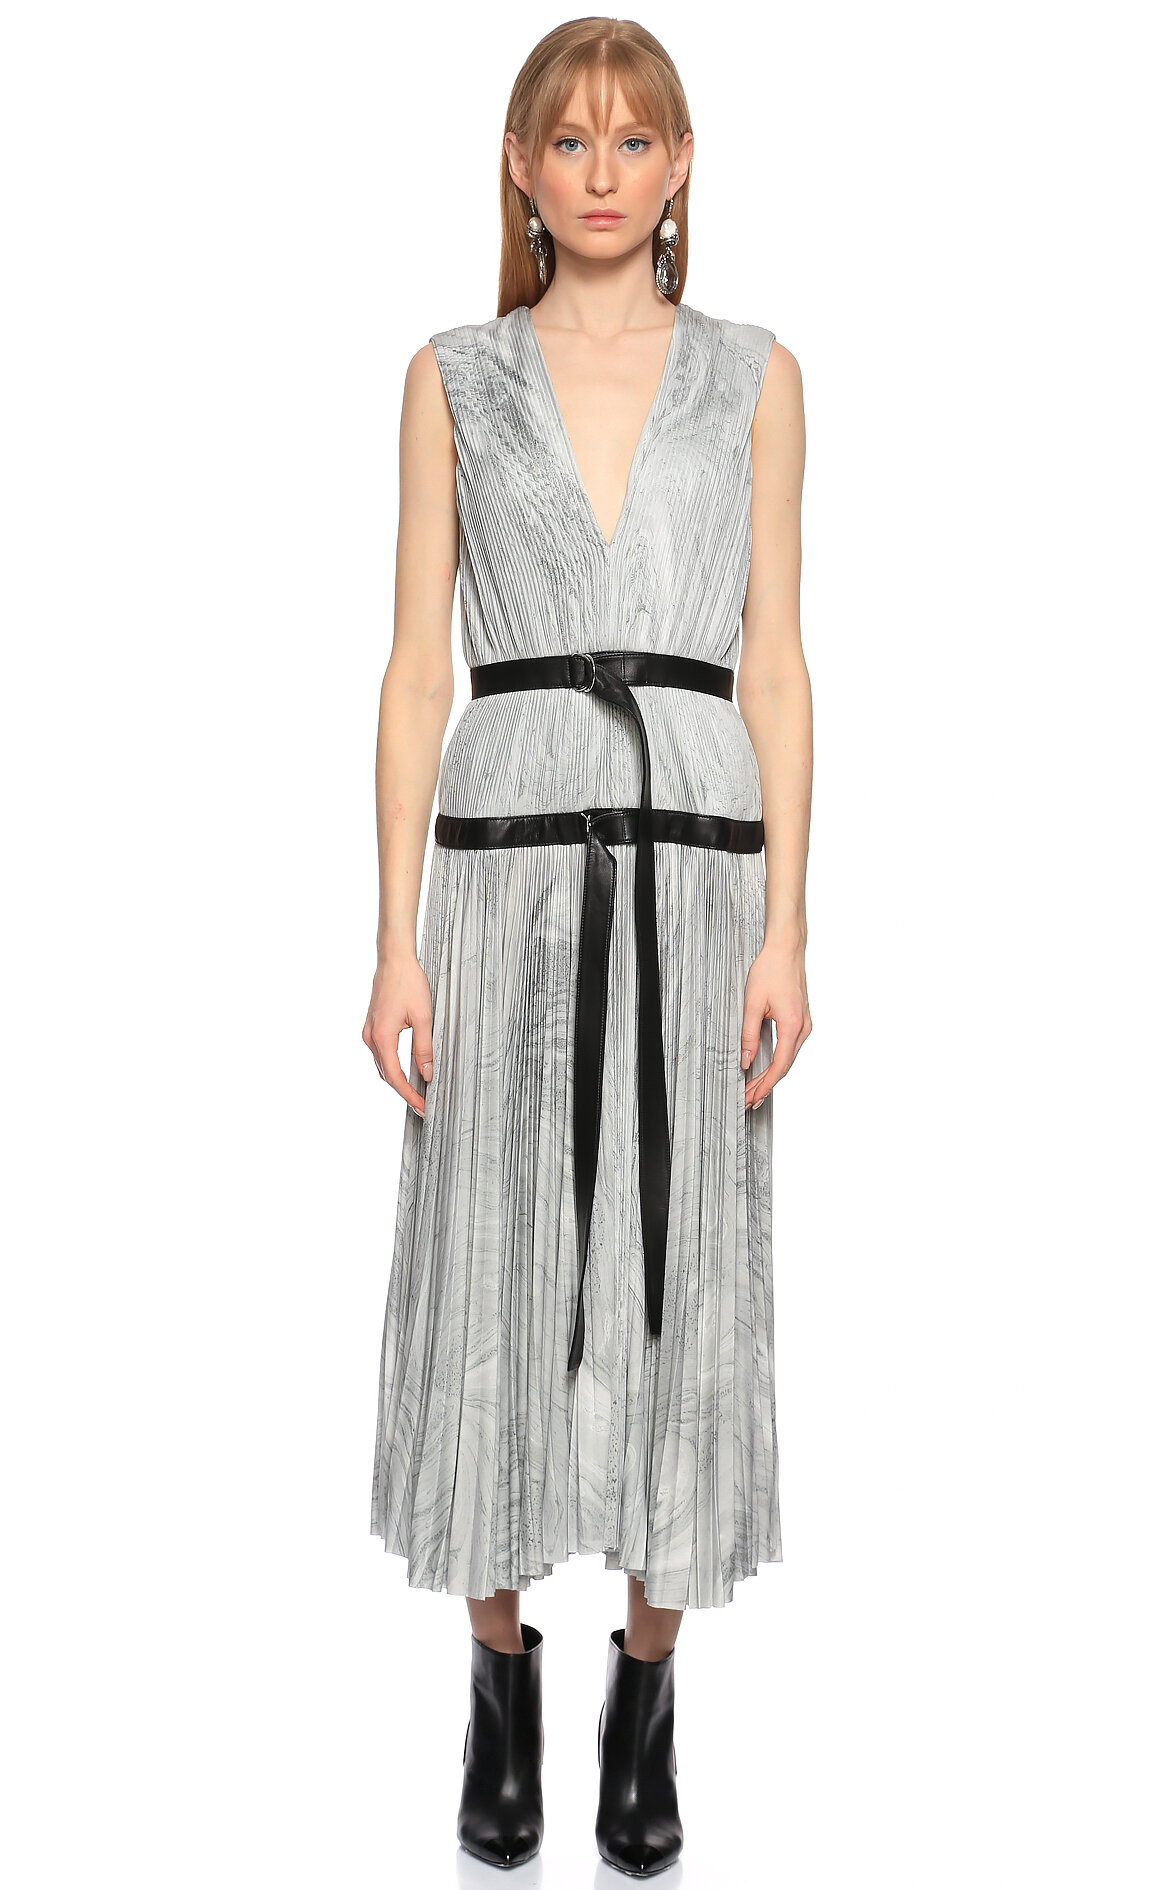 Alexander McQueen-Alexander McQueen Kemer Detaylı Piliseli Gri Midi Elbise